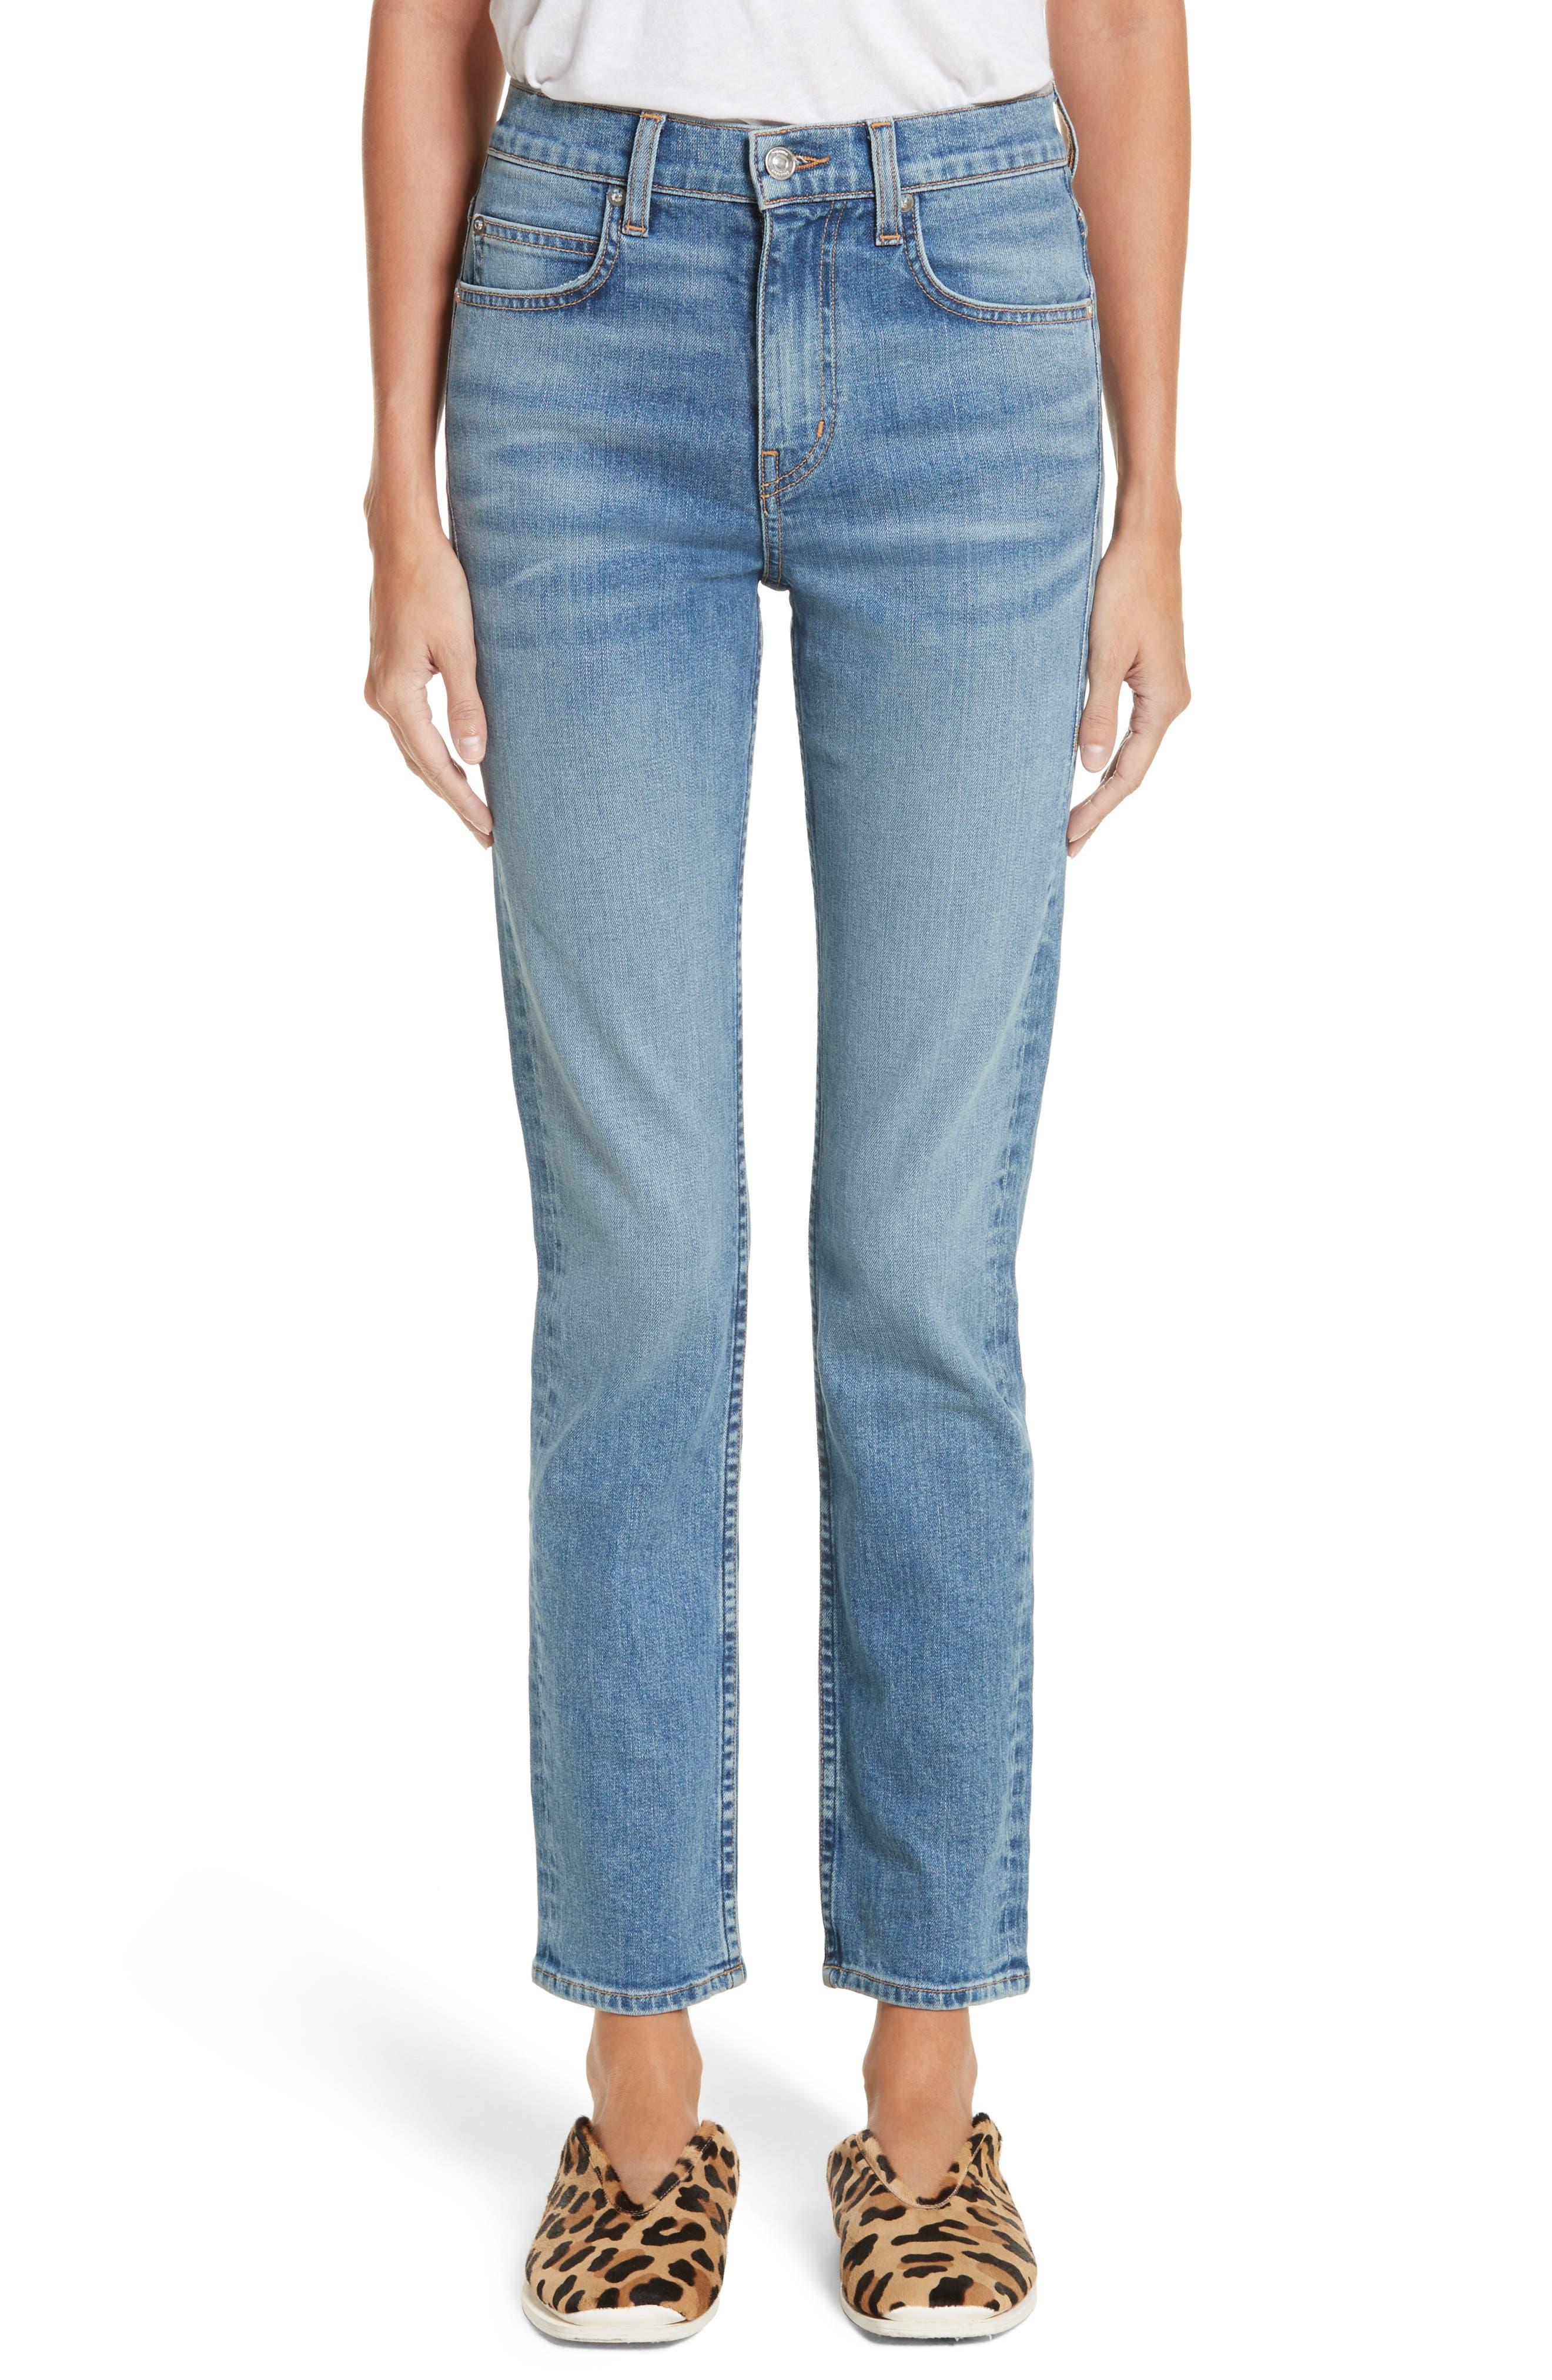 PSWL Straight Leg Jeans,                             Main thumbnail 1, color,                             428